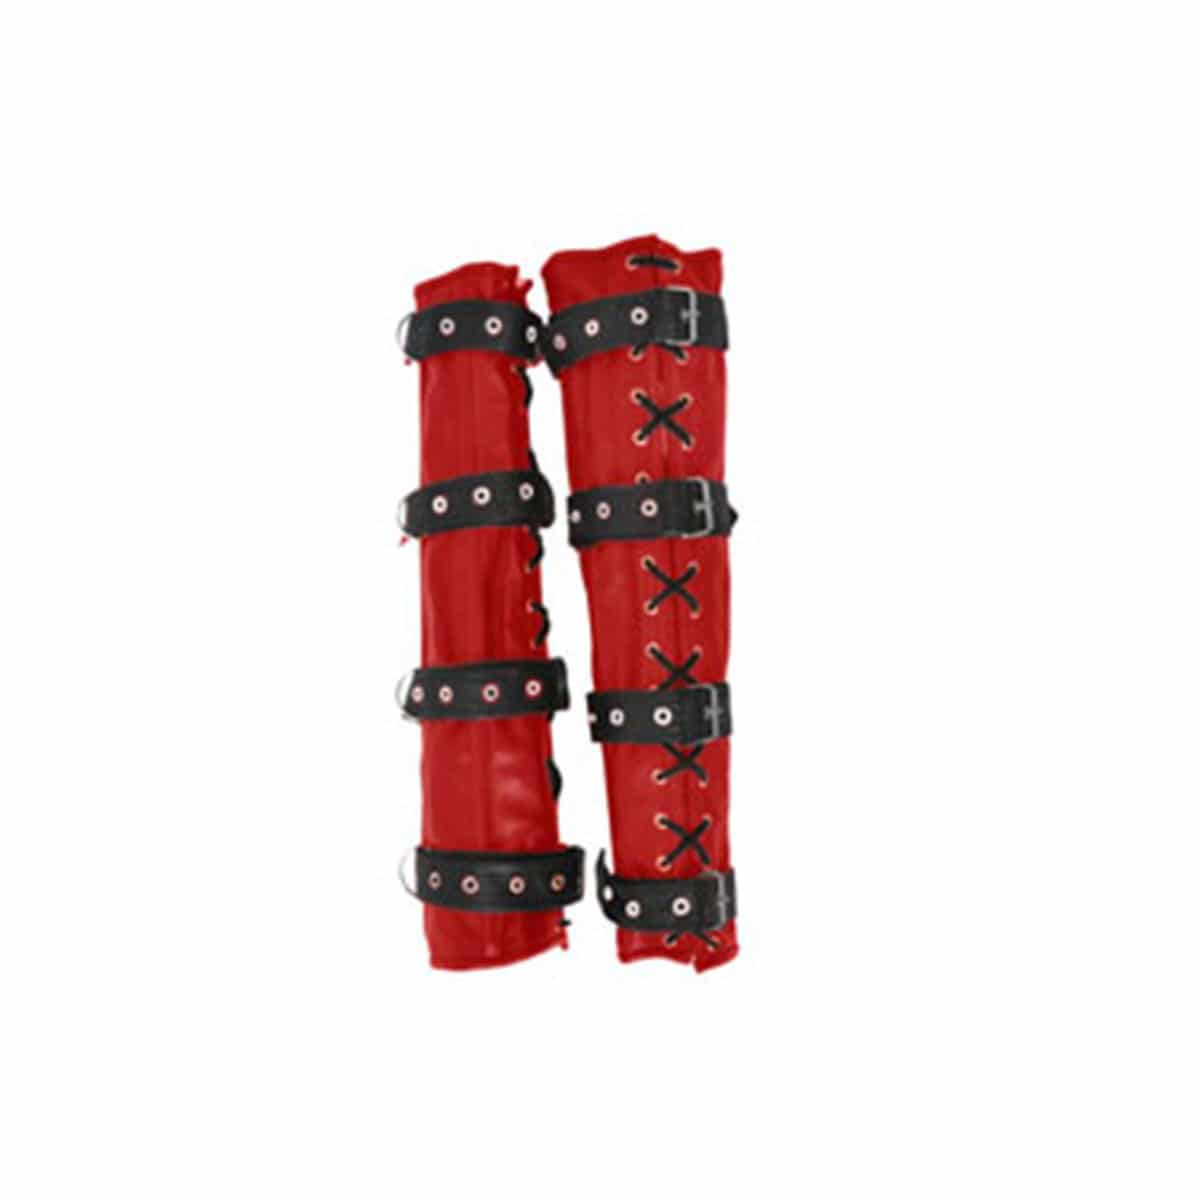 Sexy Red & Black Set Of 4 REAL Leather Bondage Arm & Leg